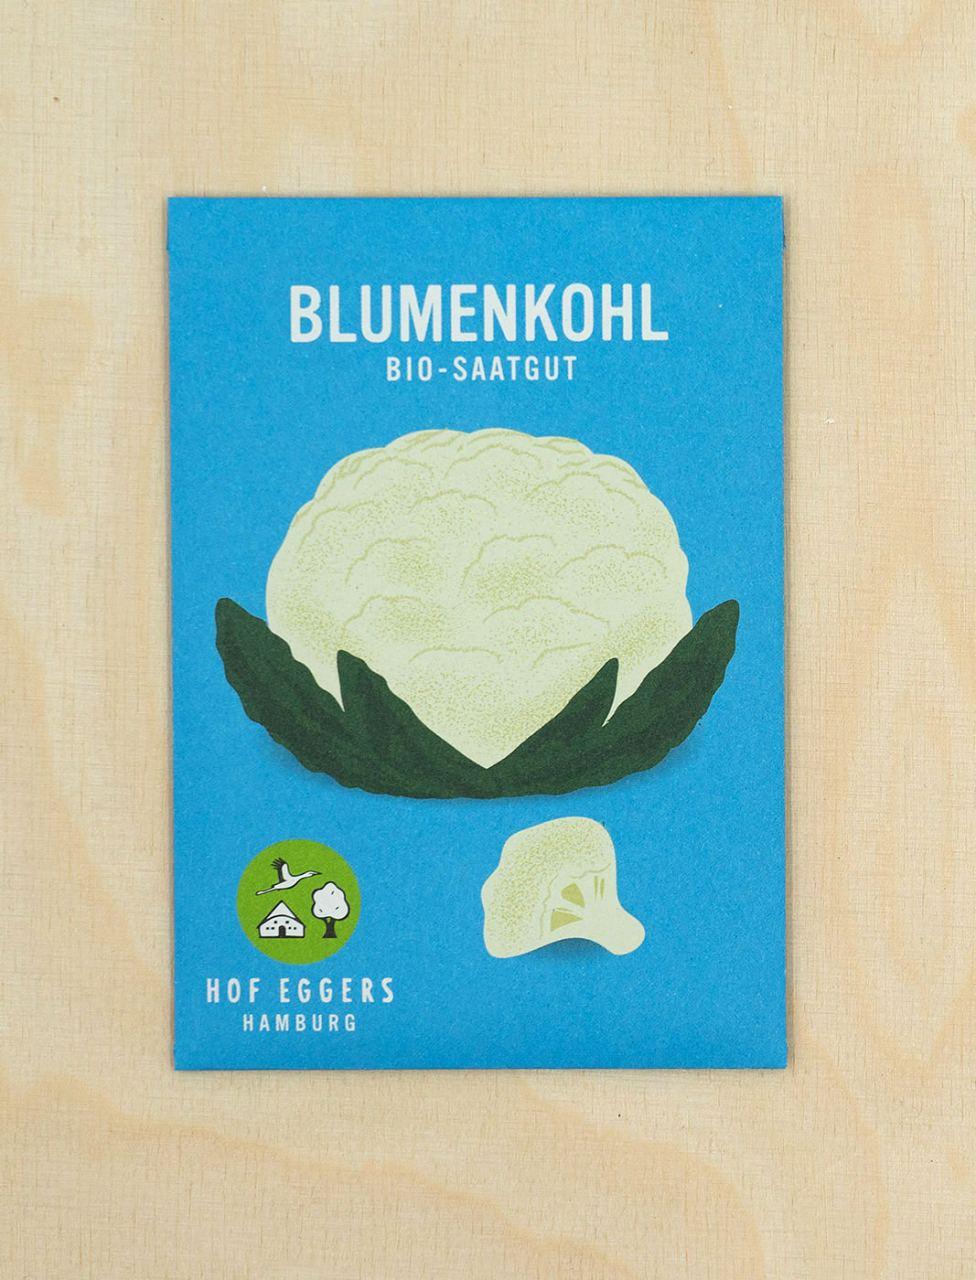 Blumenkohl Daniel, Bio-Saatgut